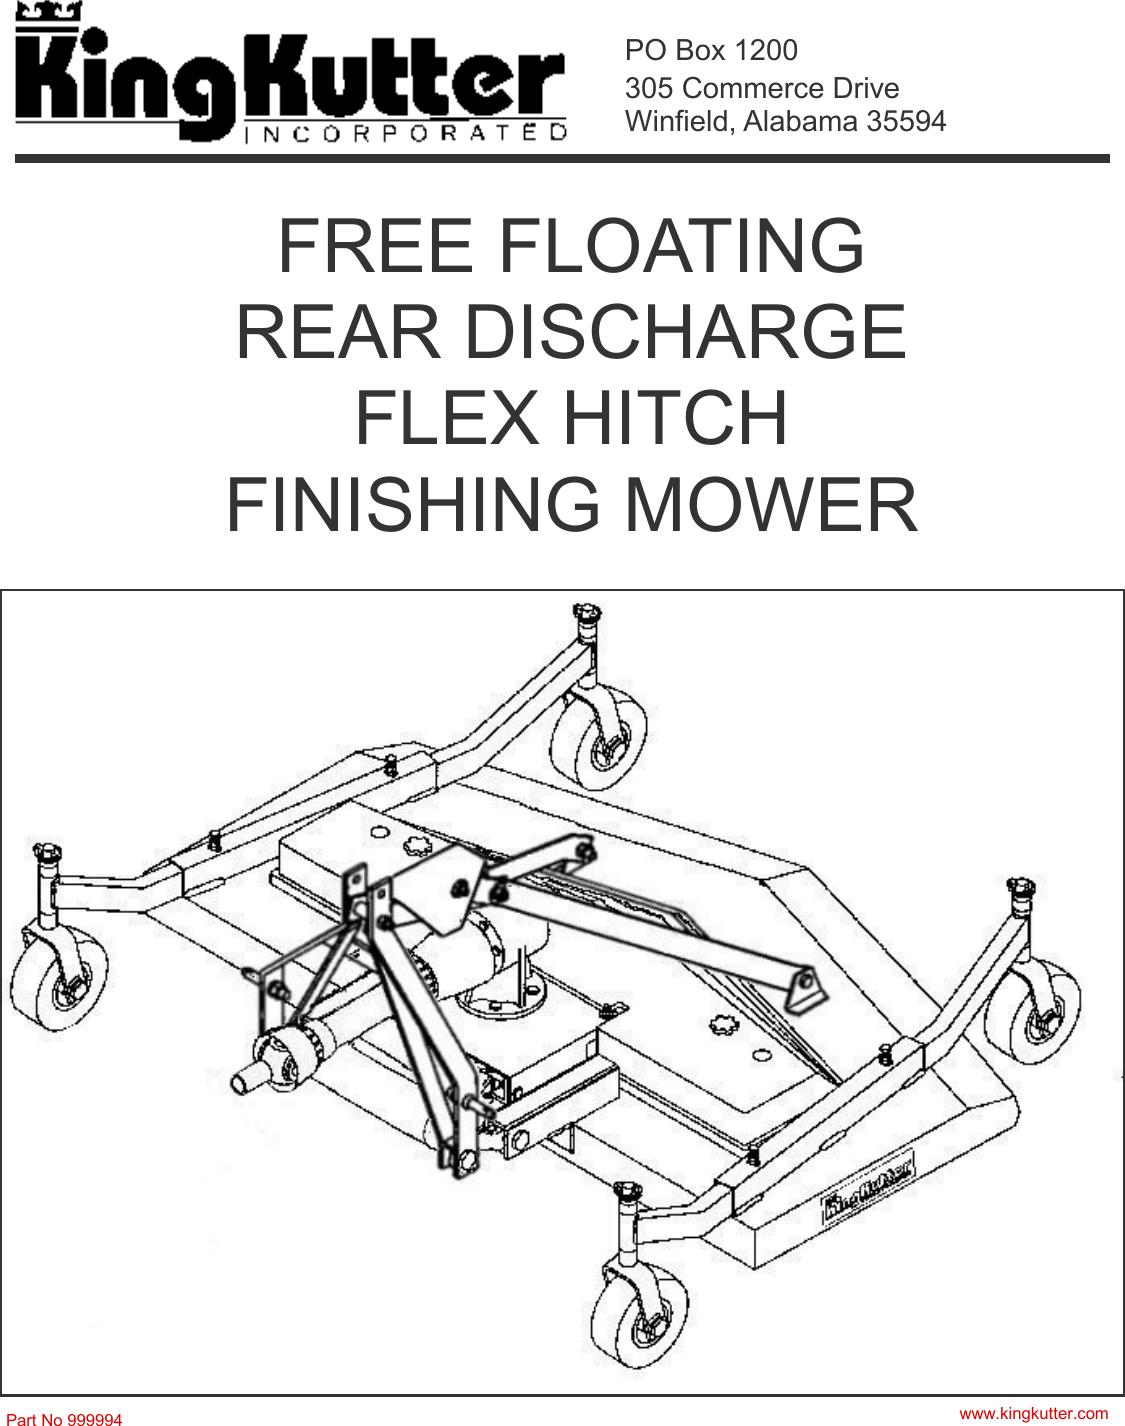 King Kutter Lawn Mower 999994 Users Manual